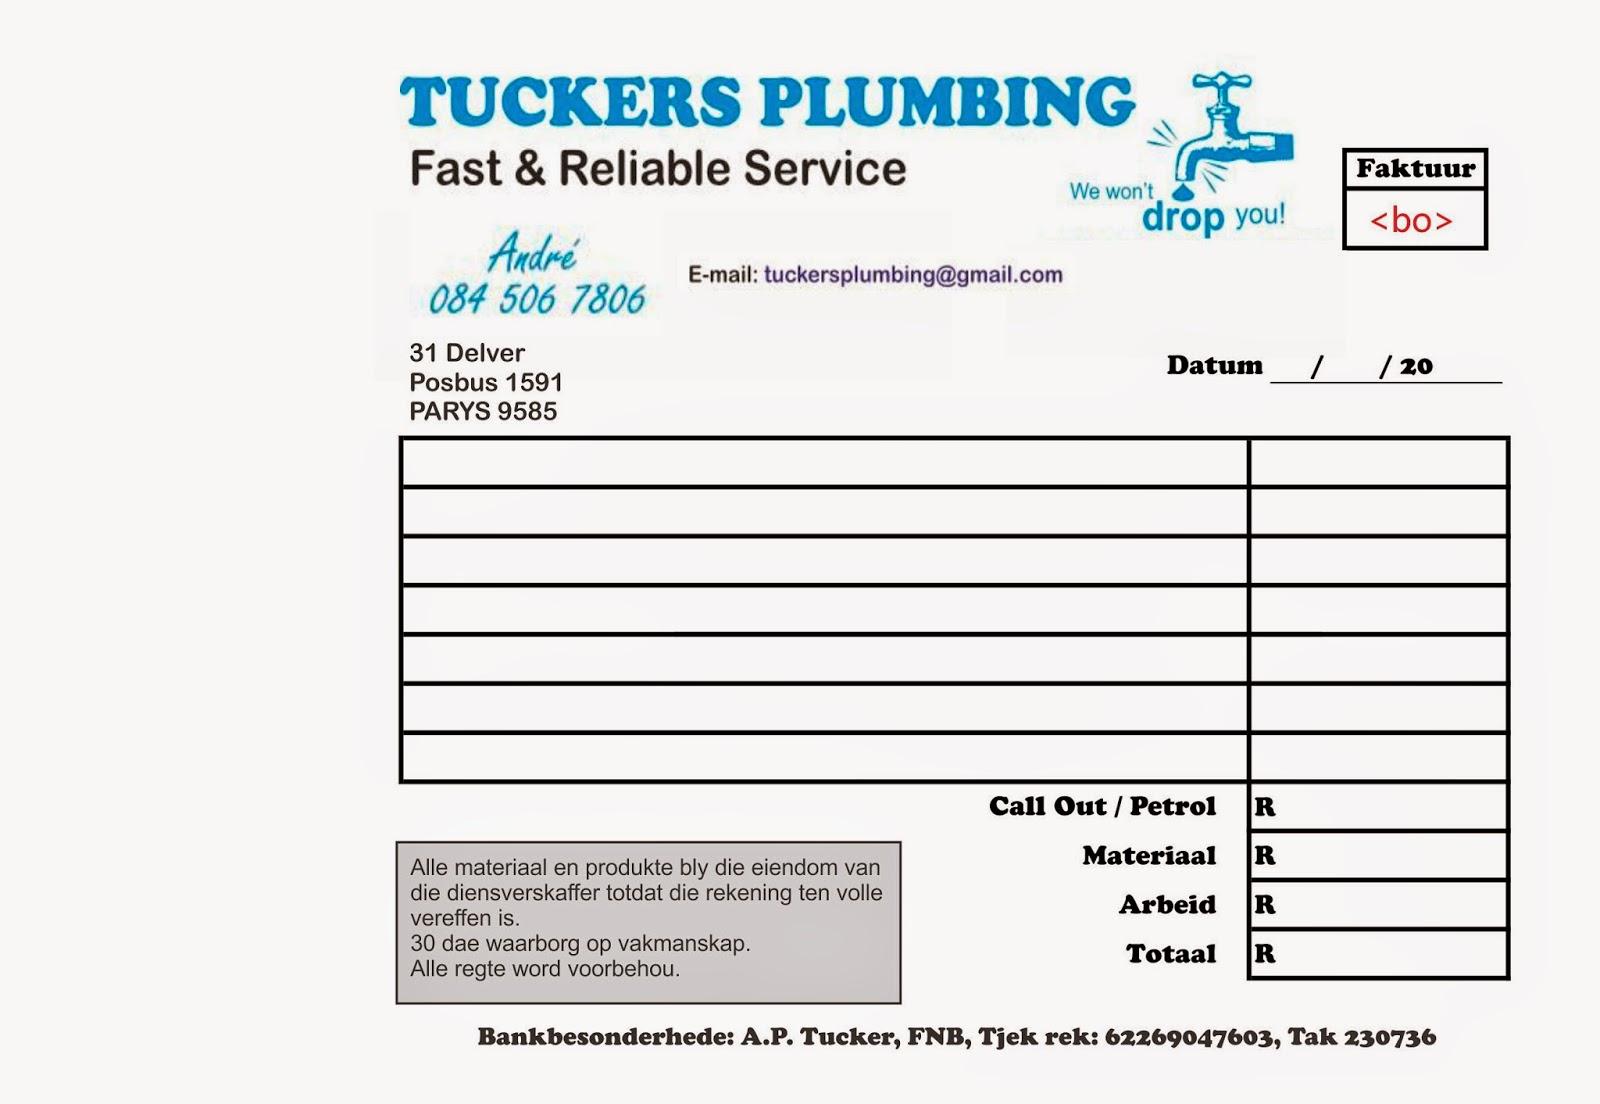 Sample Plumbing Invoice